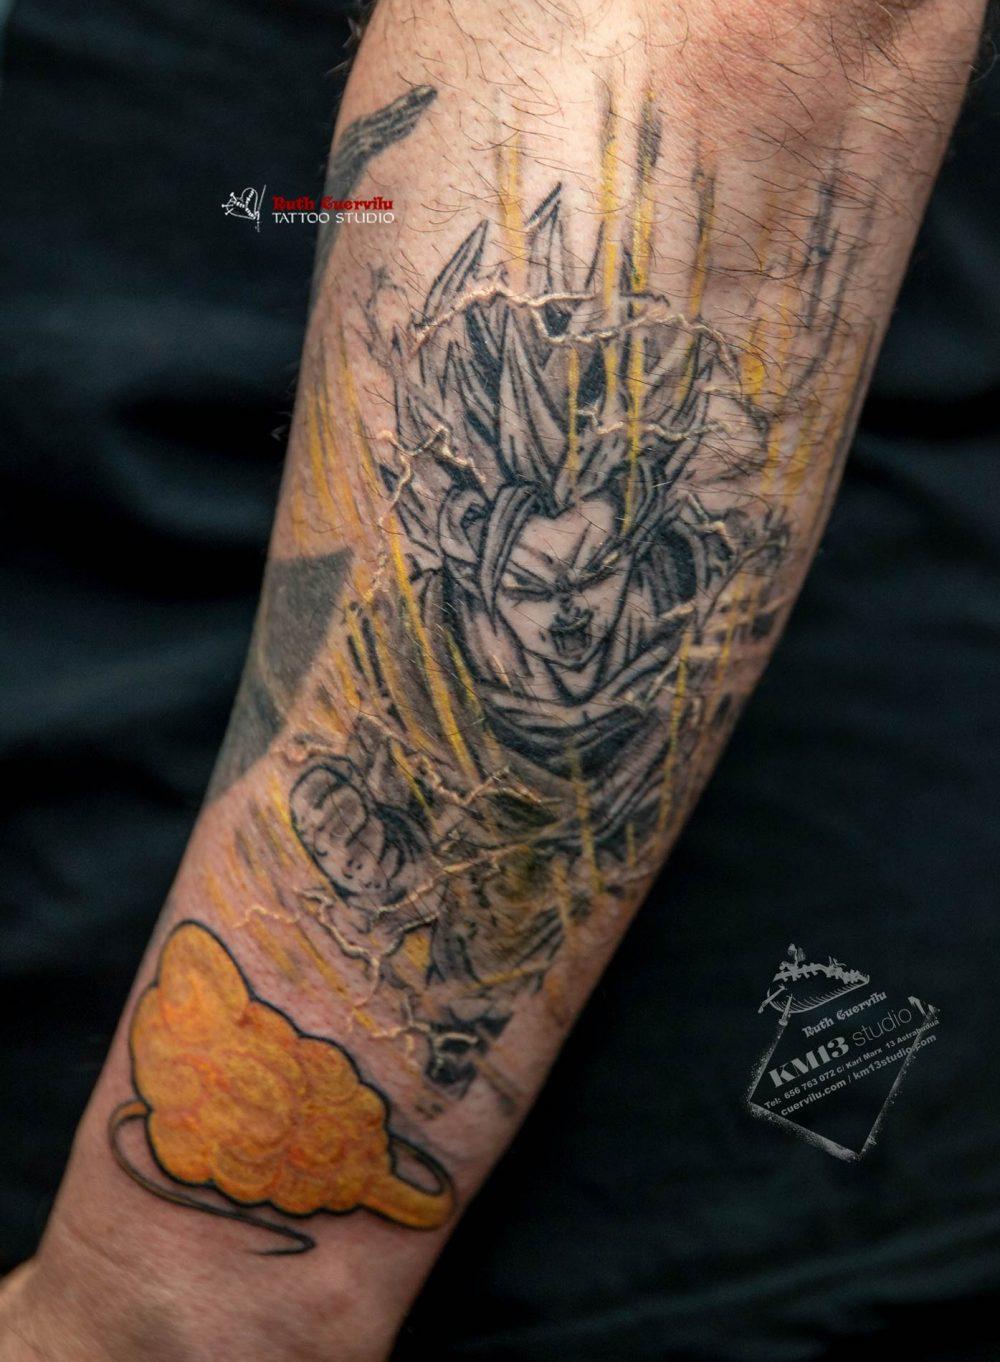 Tatuaje Goku y nube Kington - Ruth Cuervilu Tattoo - KM13 Studio - Estudio de tatuajes en Astrabudua Erandio bizkaia bilbao